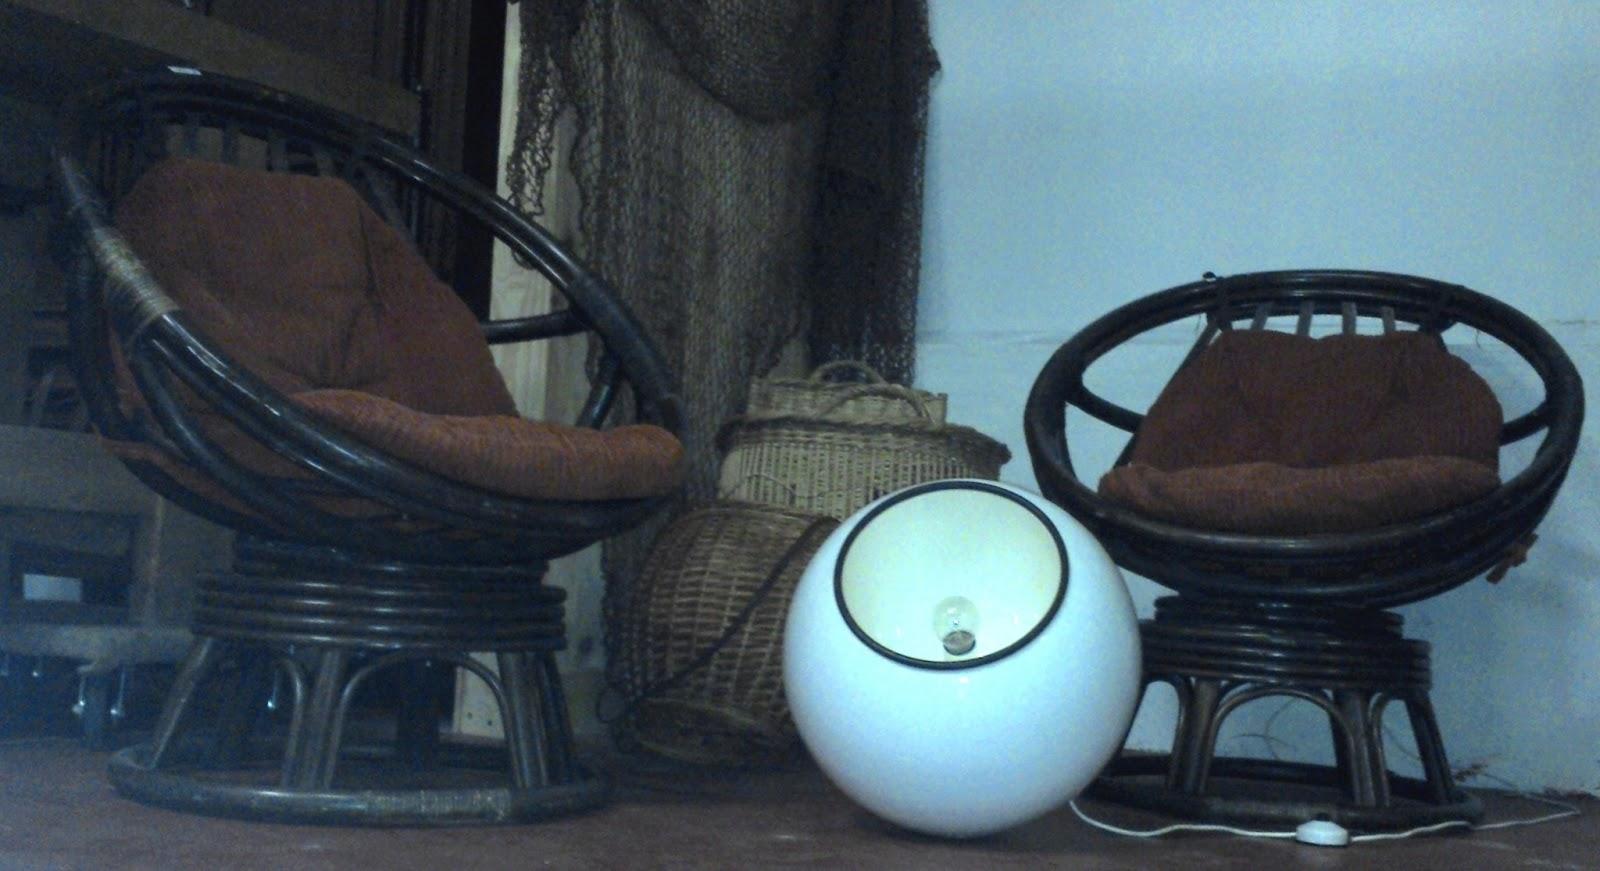 paire fauteuils uf rotins balancelle vintage 1970 bambou. Black Bedroom Furniture Sets. Home Design Ideas